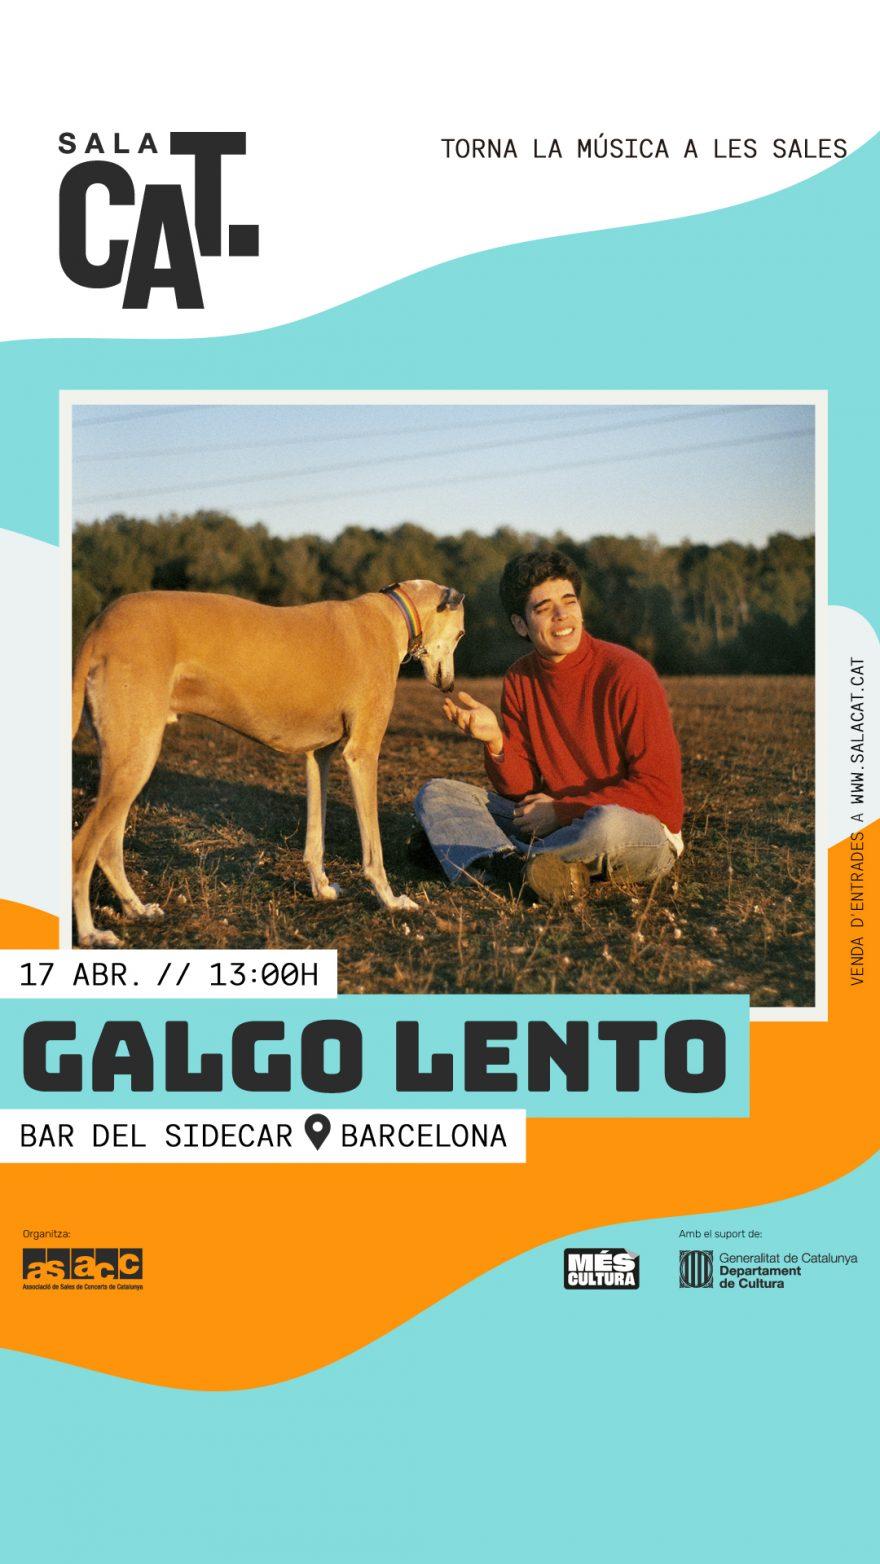 Cartell del concert de Galgo Lento a Sidecar